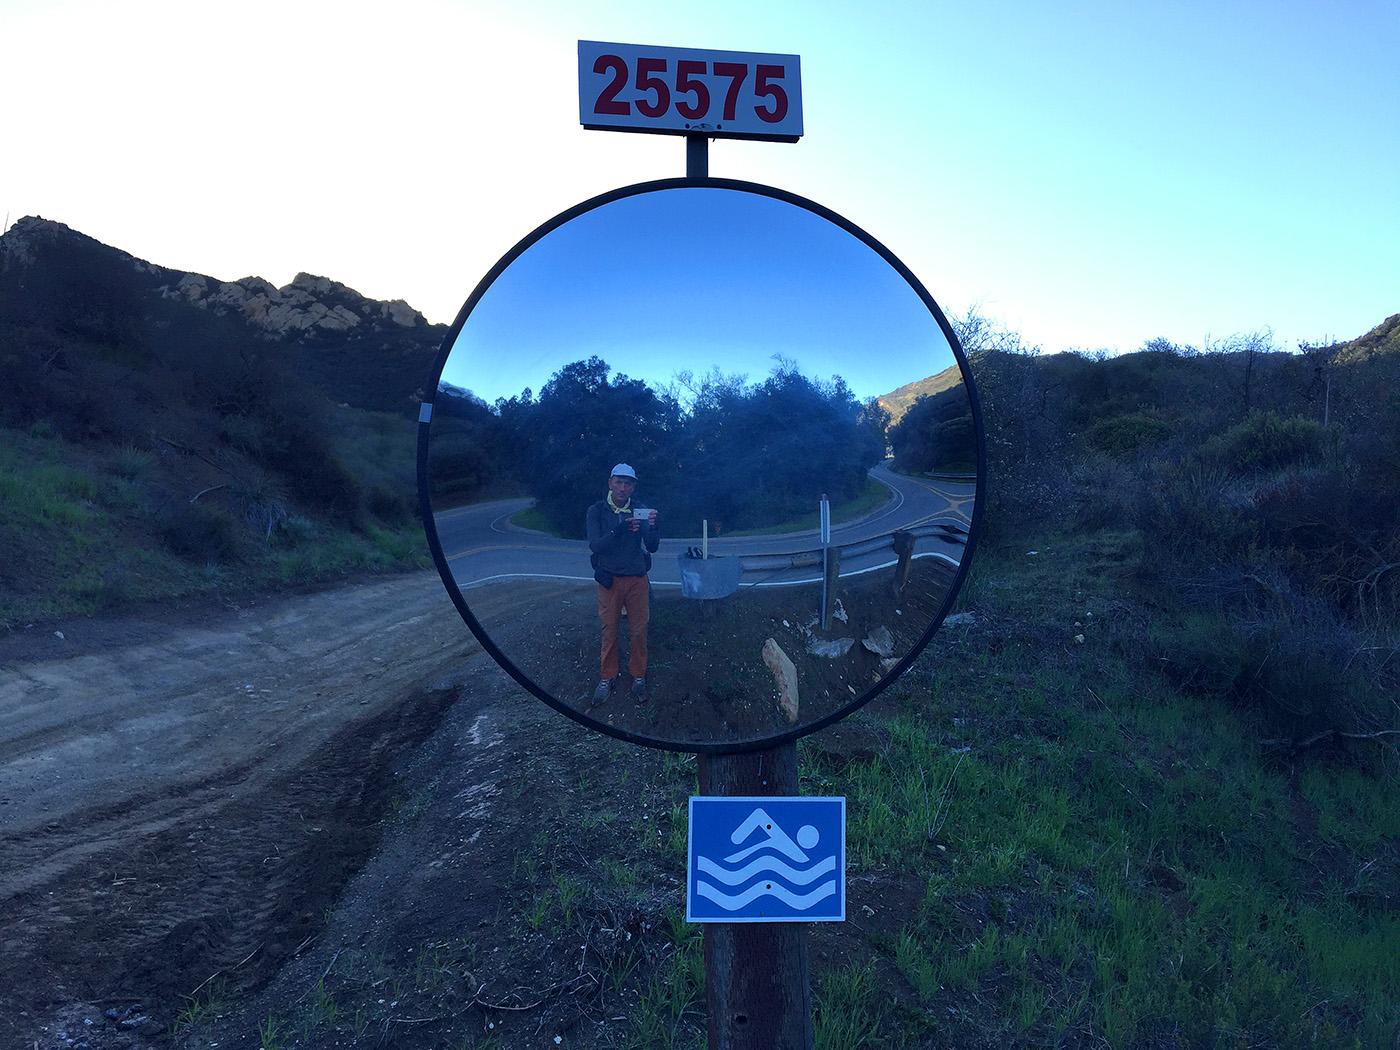 backbone-trail-trailnamebackstroke-3586.jpg